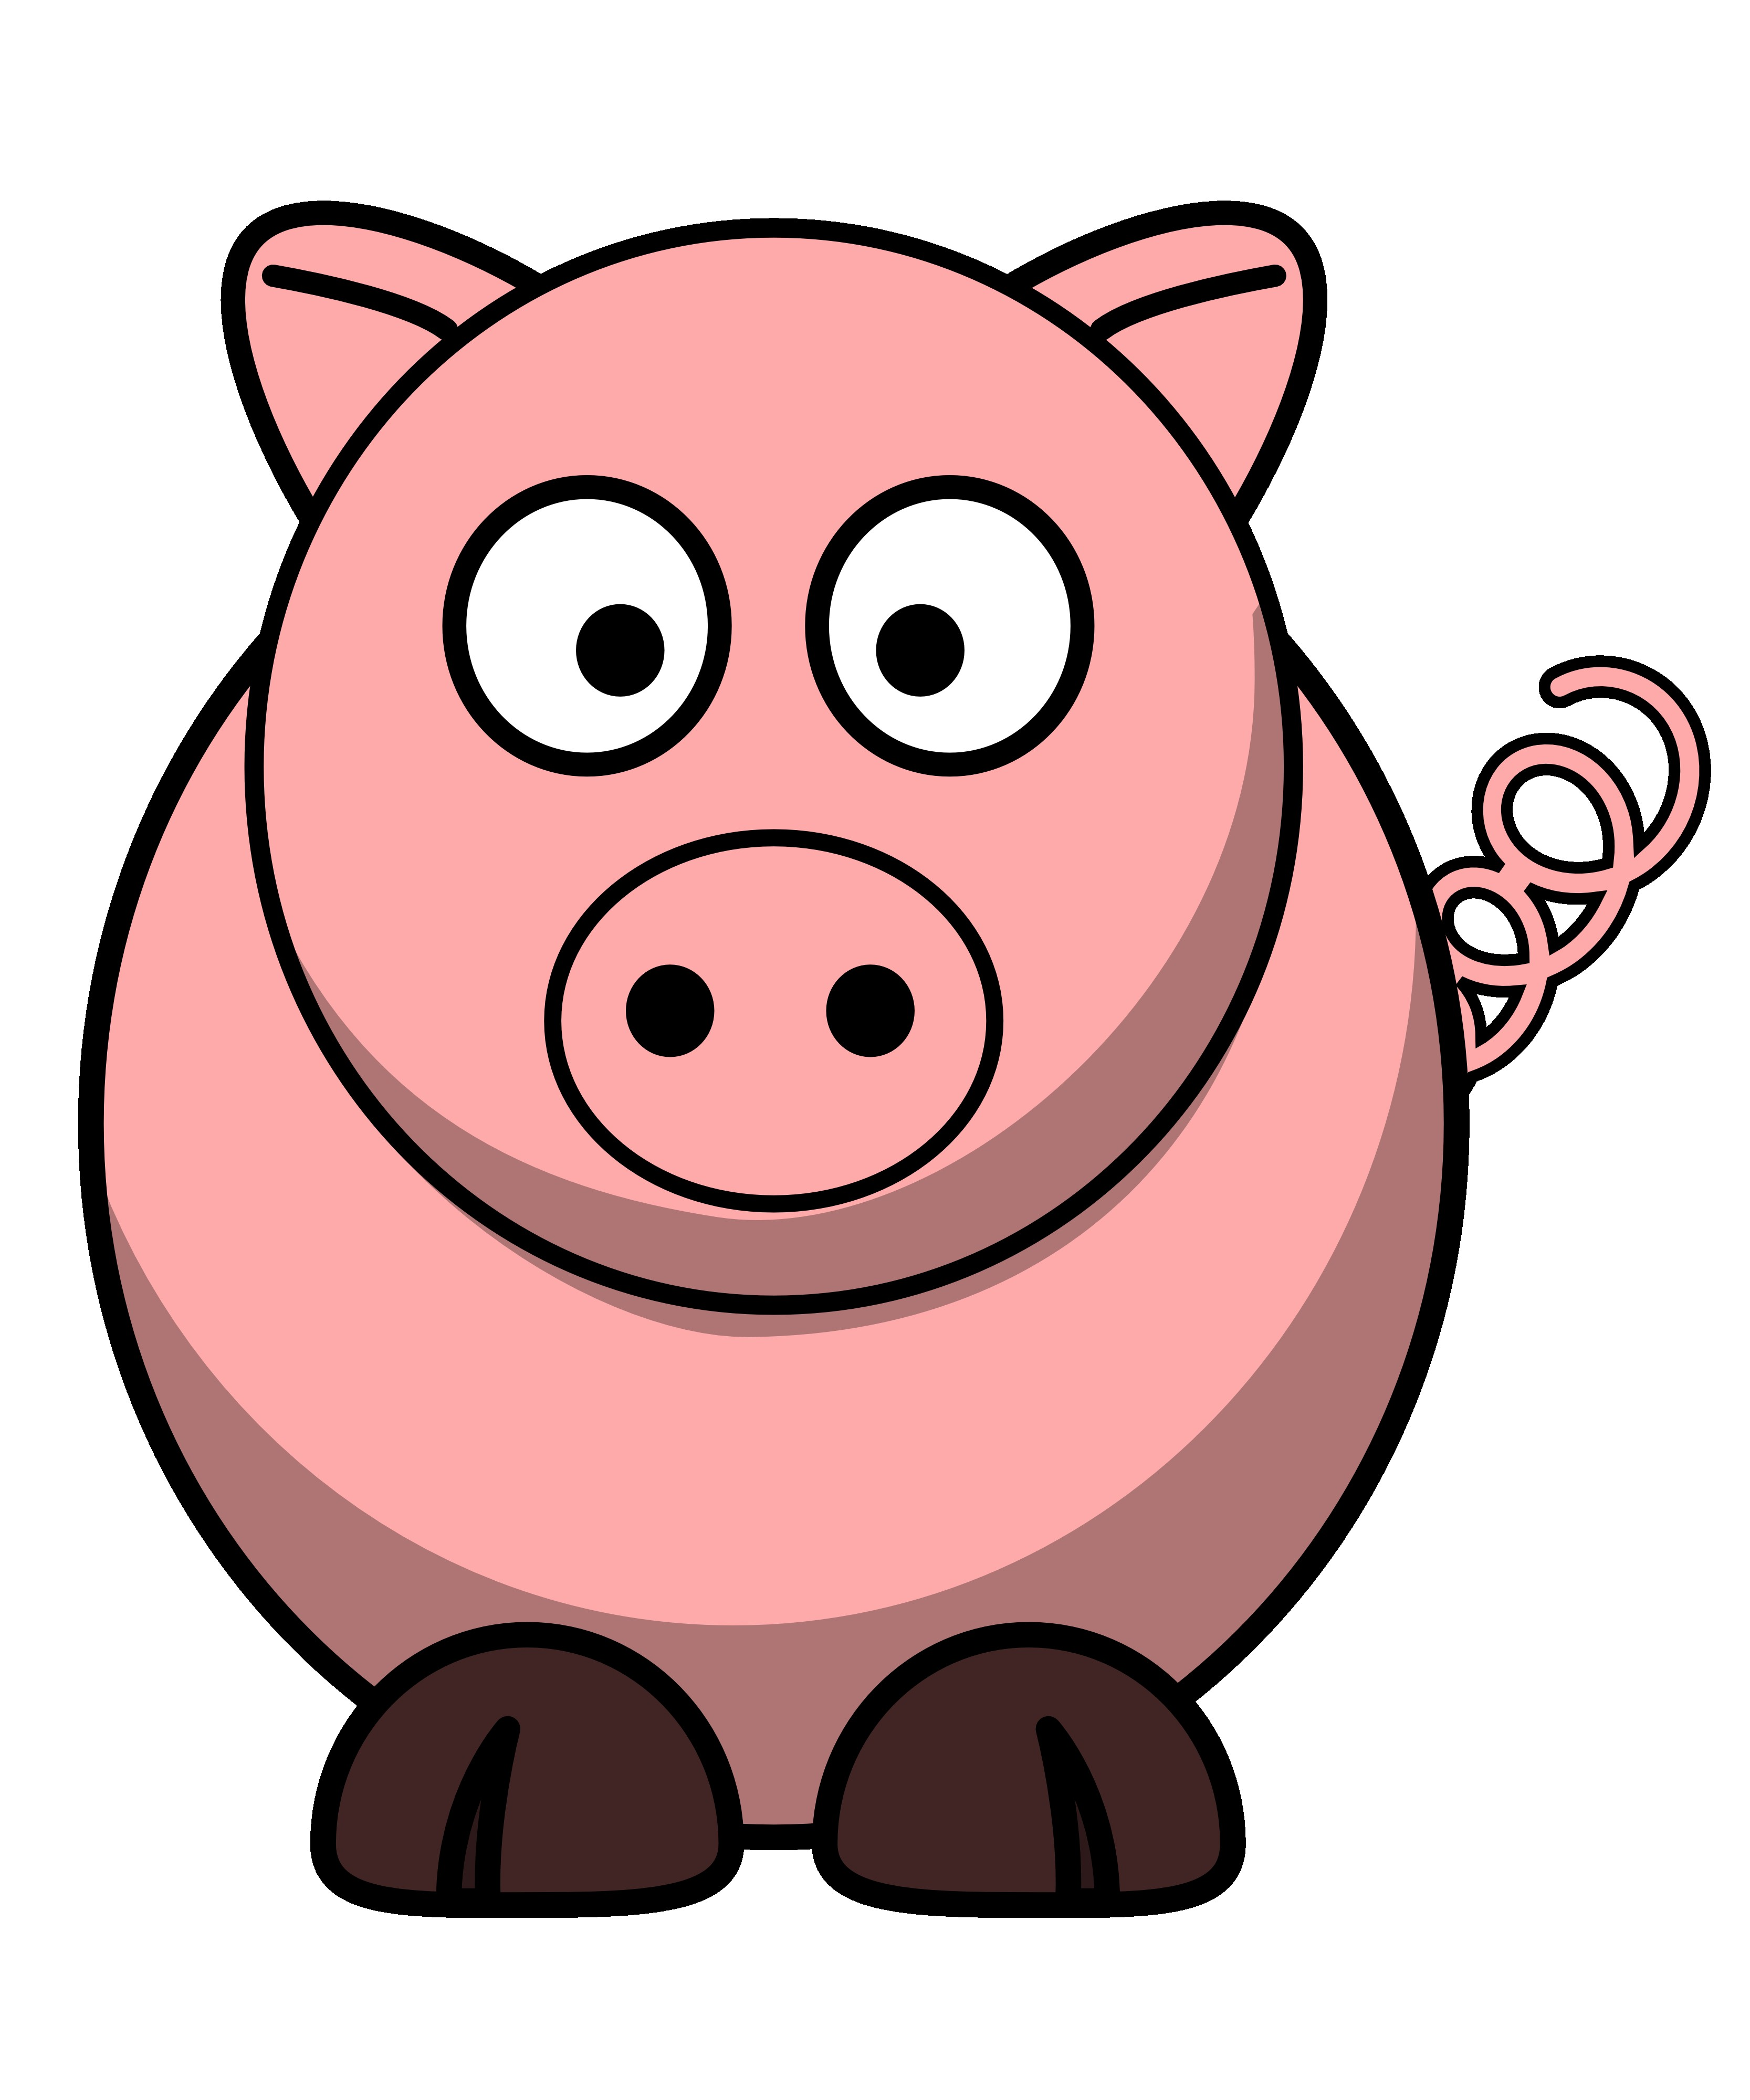 Pig Clip Art Cartoon.